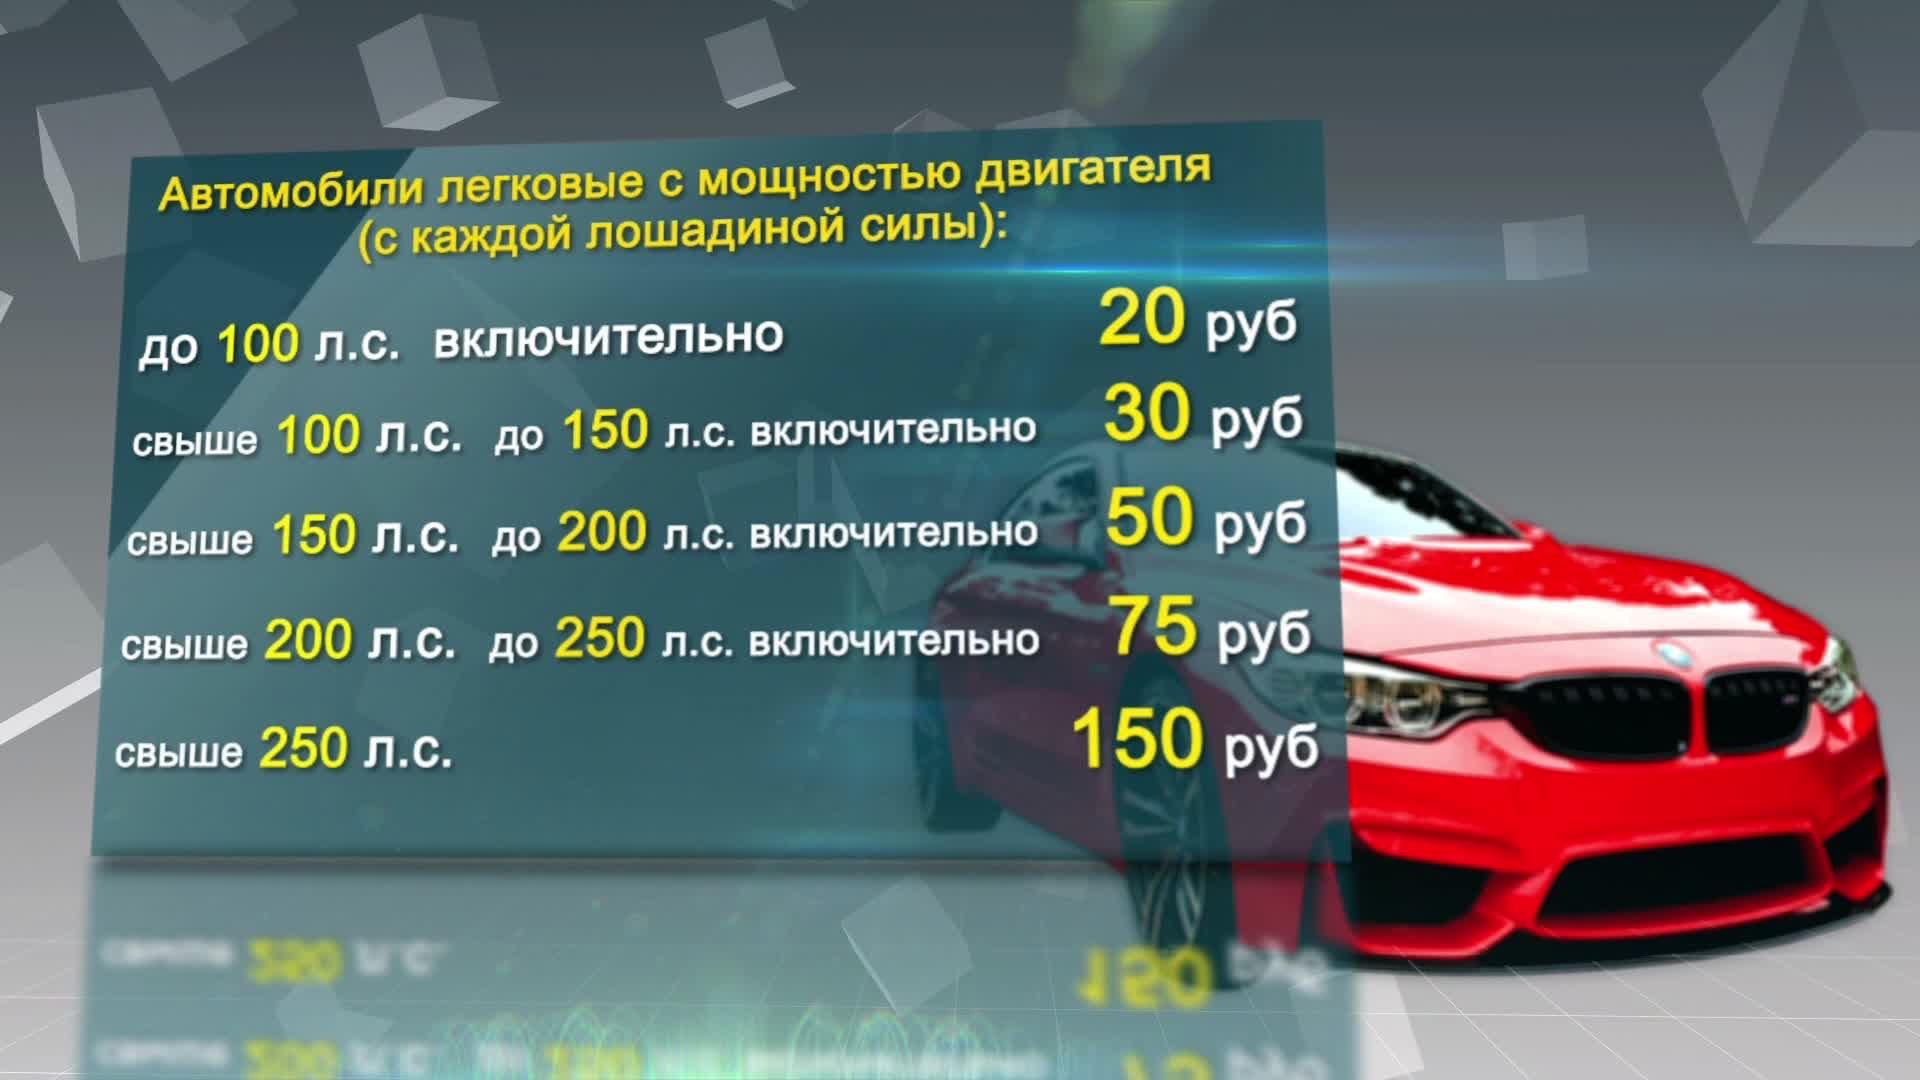 www/nalog 78.ru ставки транспортного налога в спб на 2011г